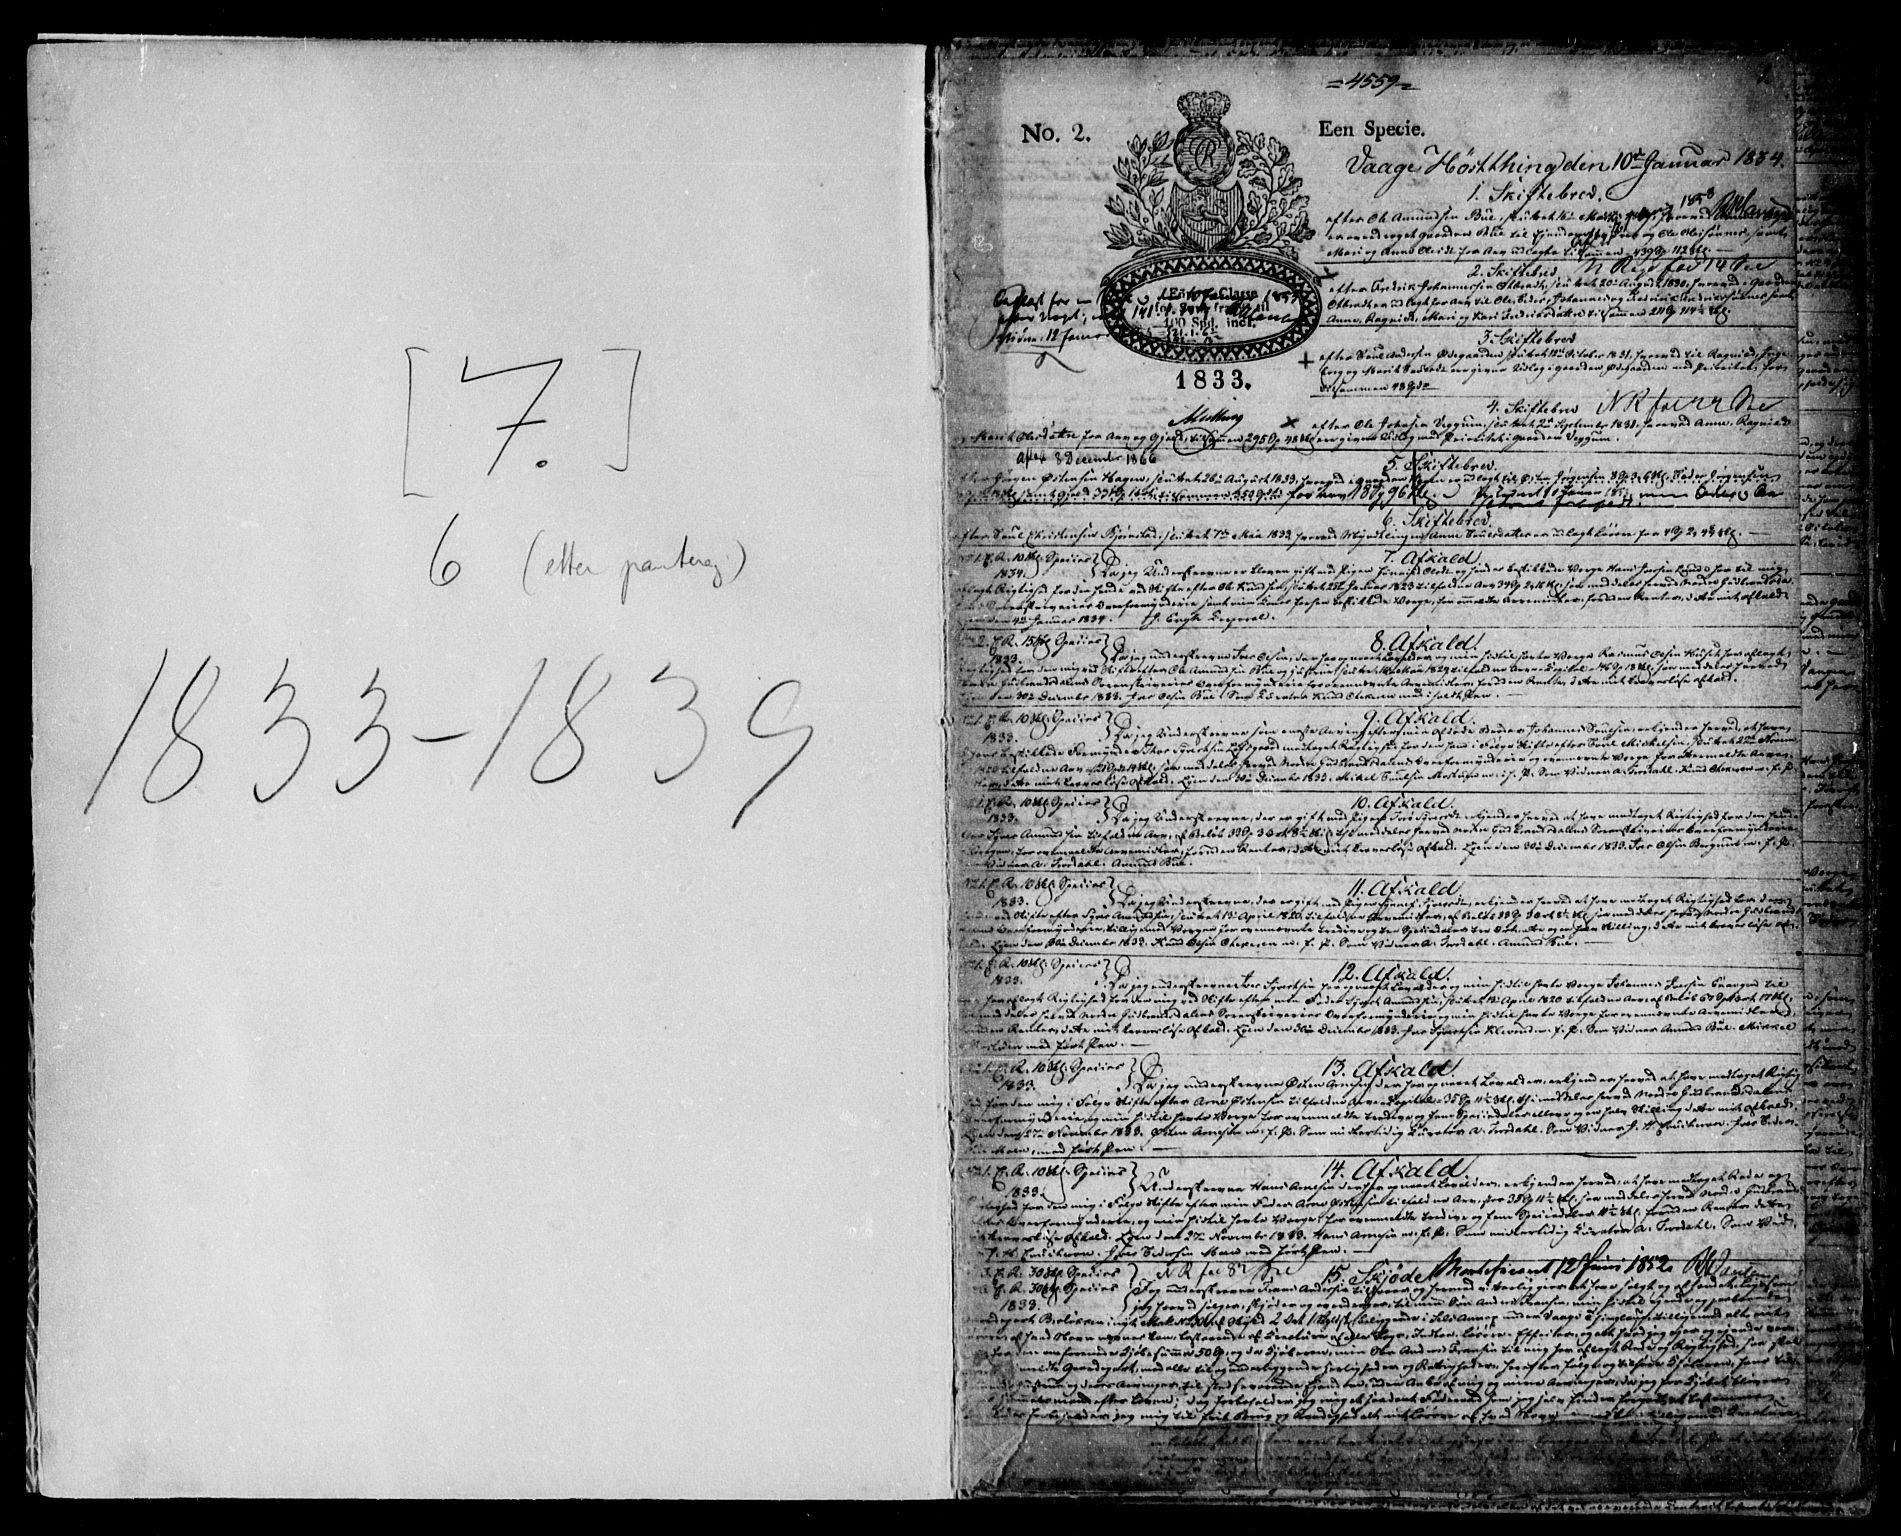 SAH, Nord-Gudbrandsdal tingrett, H/Hb/Hba/L0006: Pantebok nr. 6, 1834-1839, s. 1